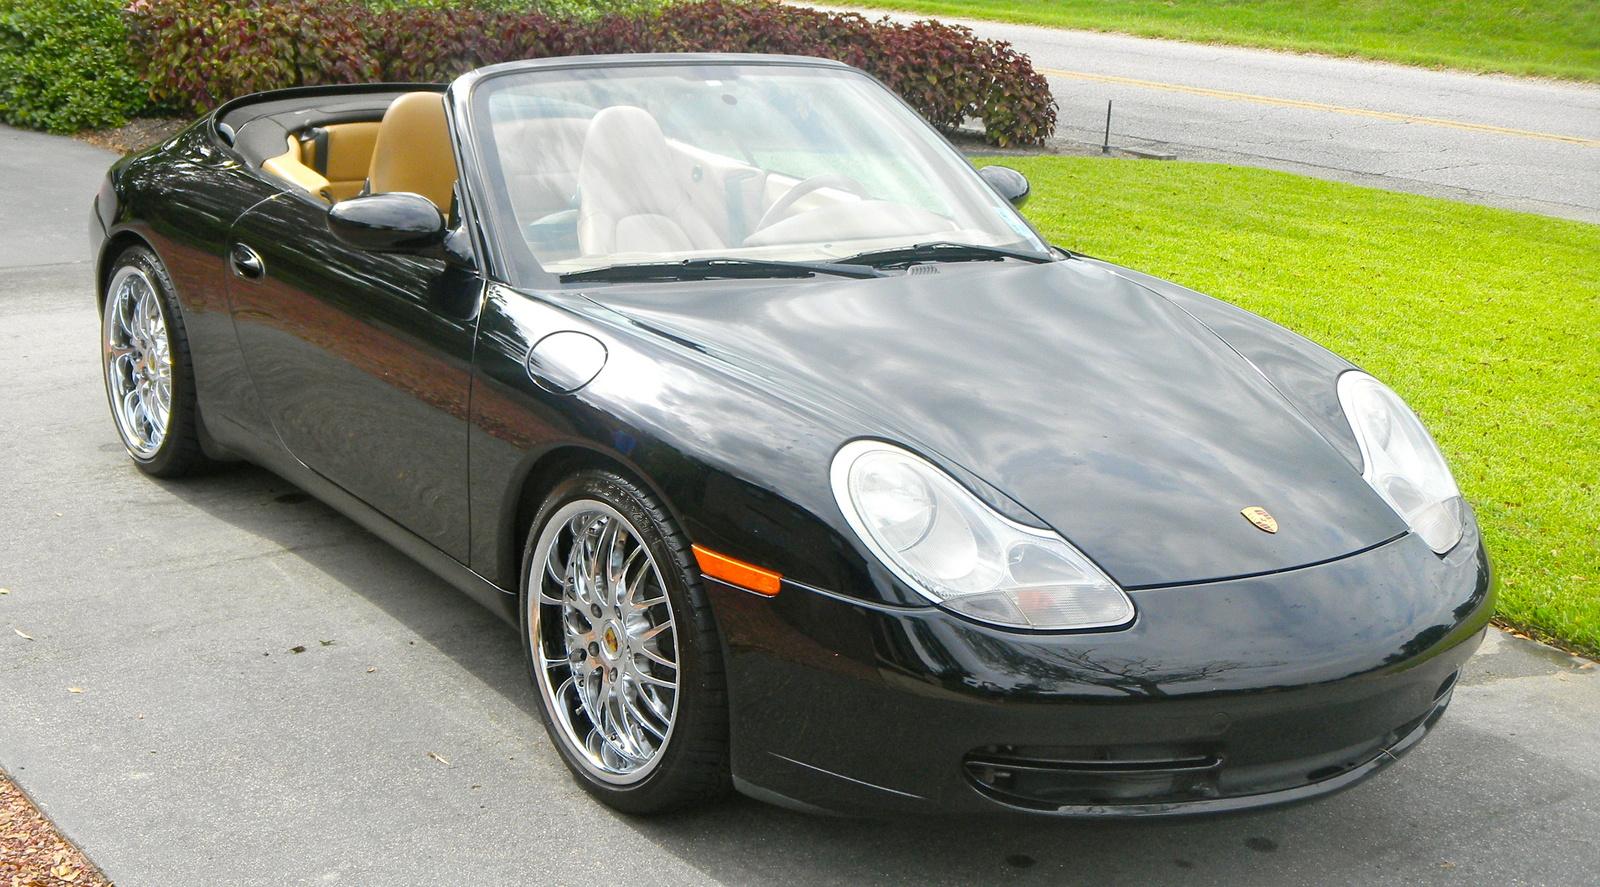 Porsche 911 - Wikipedia 2000 new 9/11 pictures